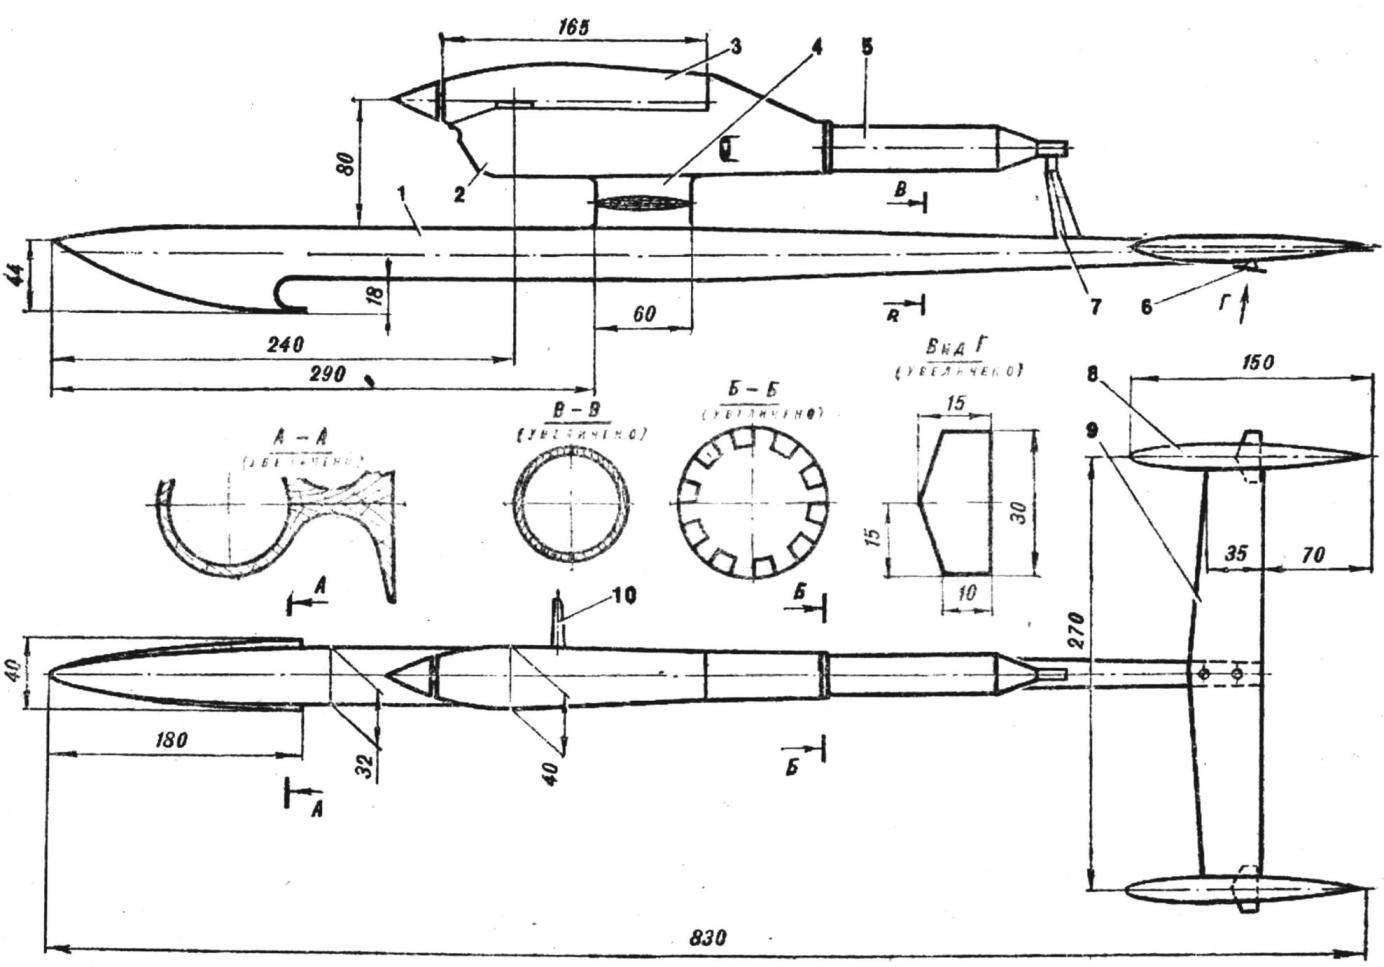 Speed sudomodel class-1